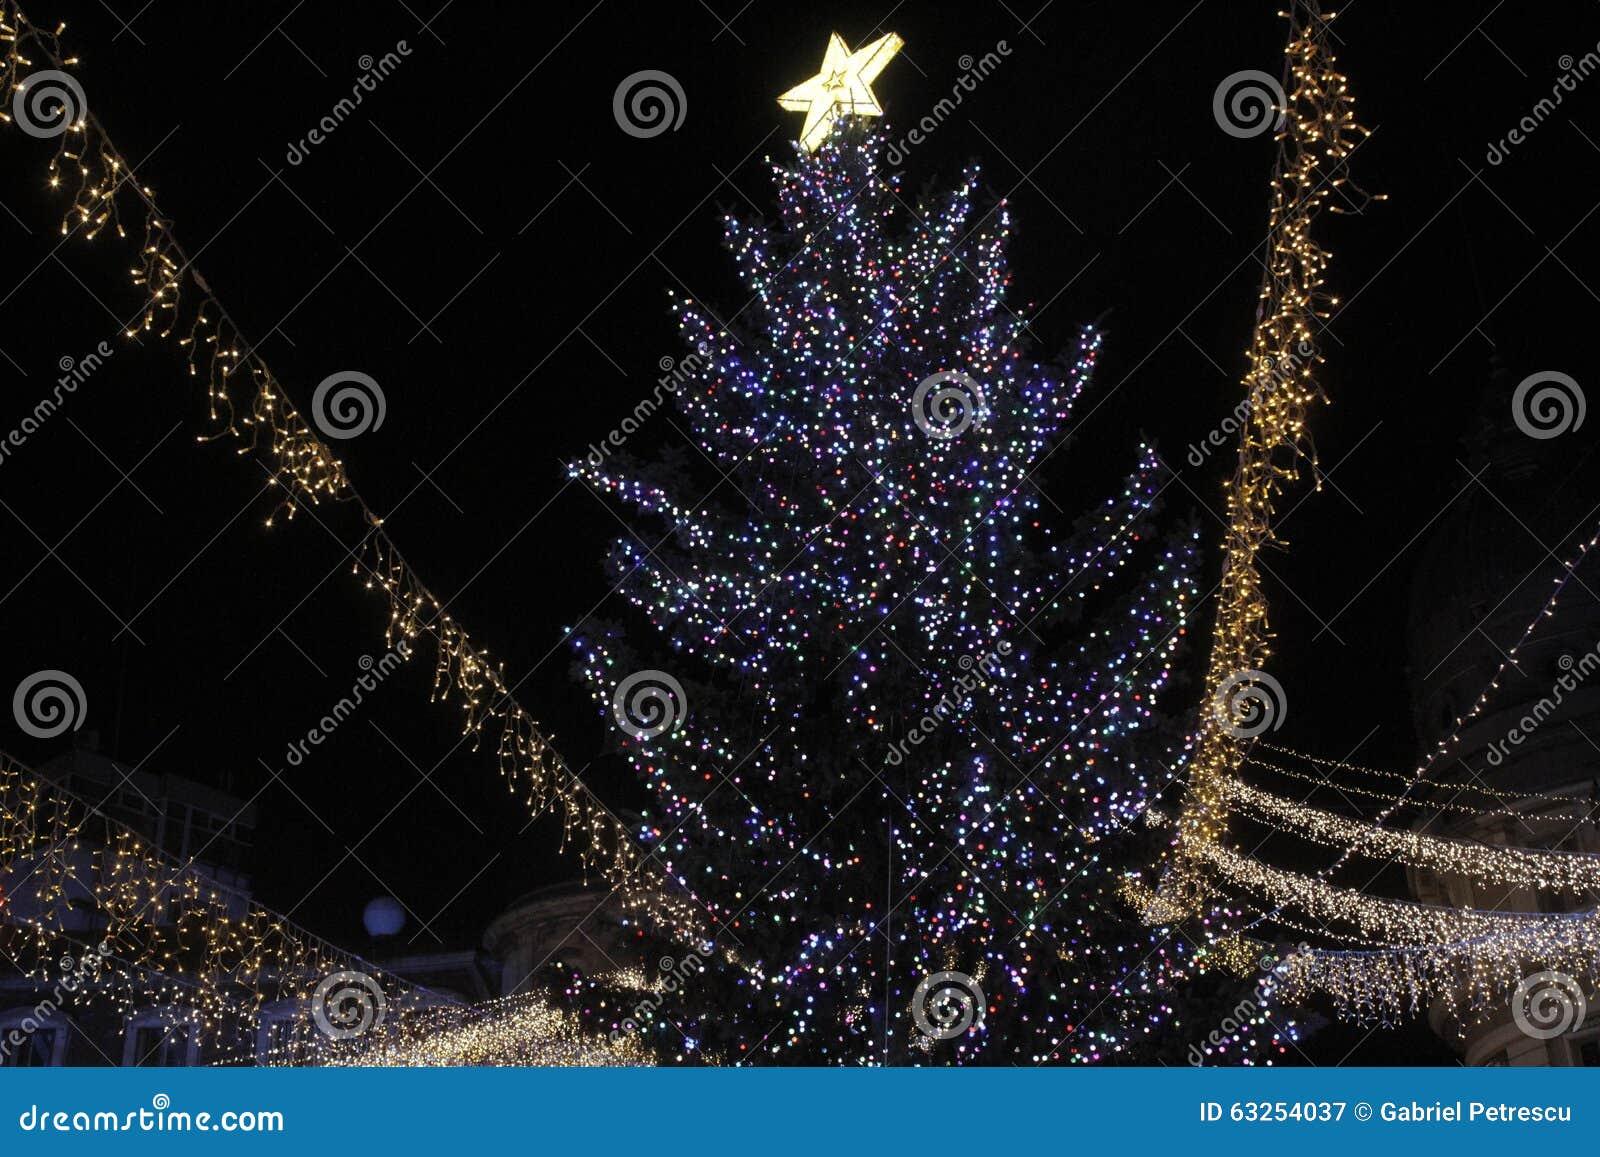 Romanian Christmas Decorations